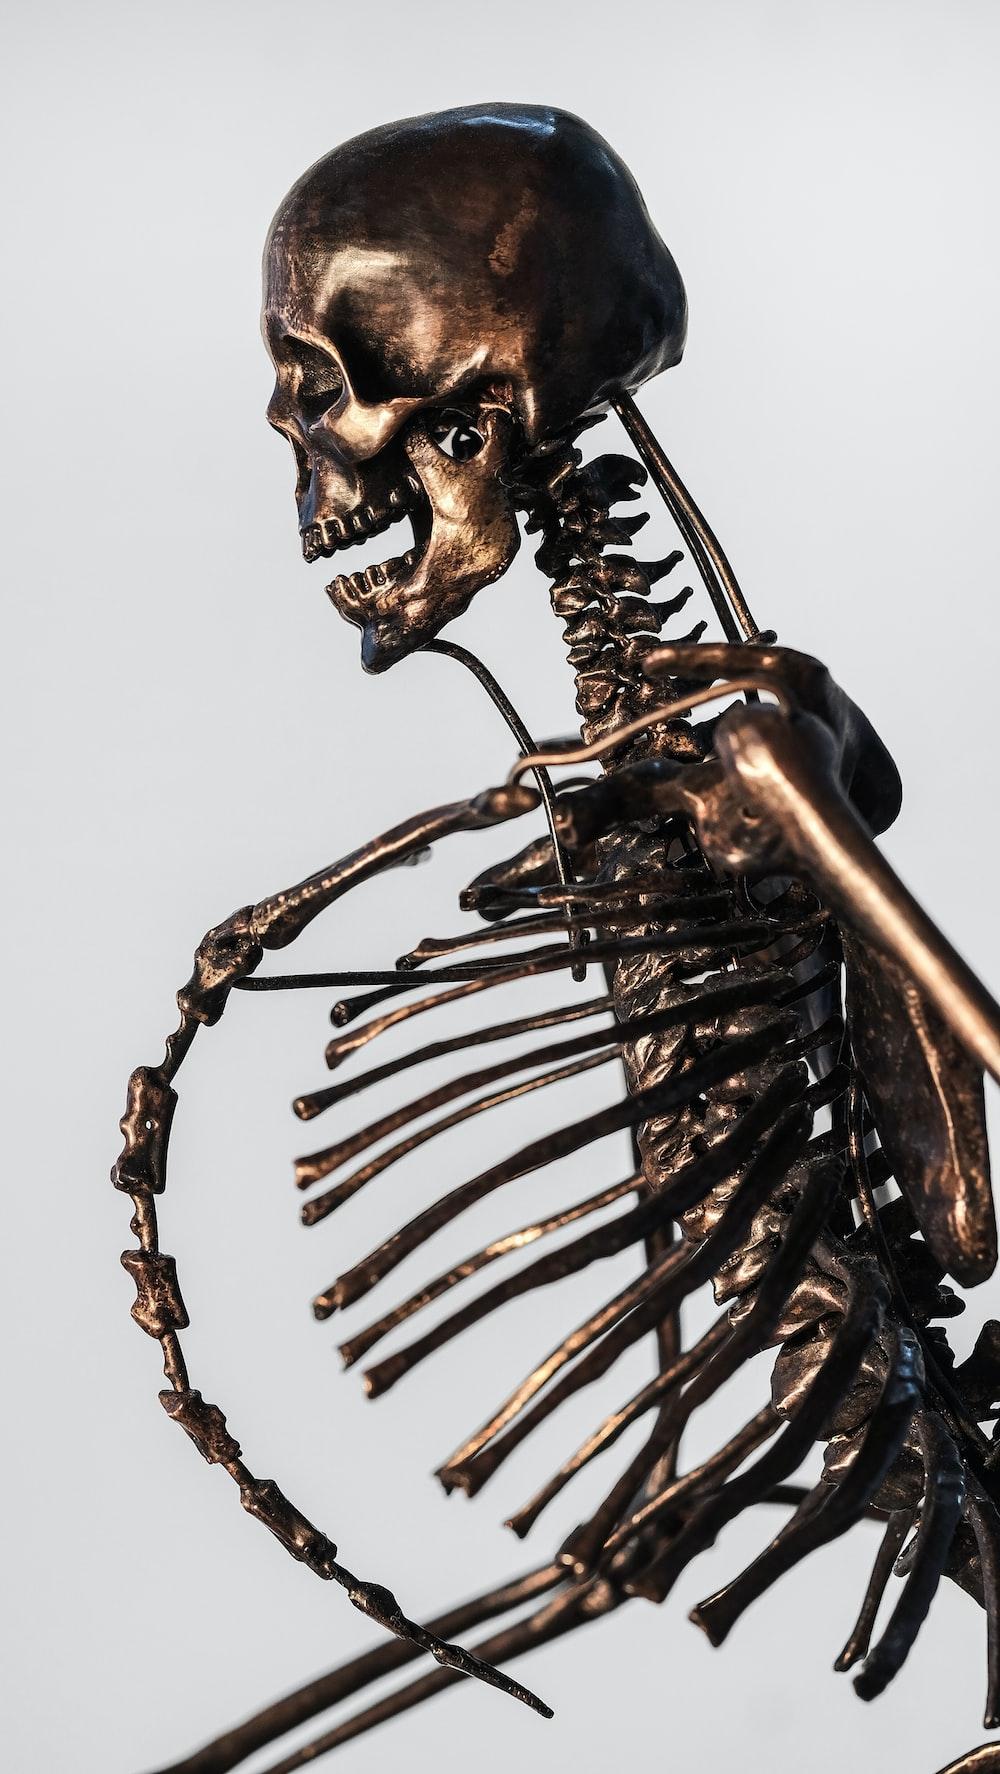 Skeleton Pictures Hd Download Free Images On Unsplash